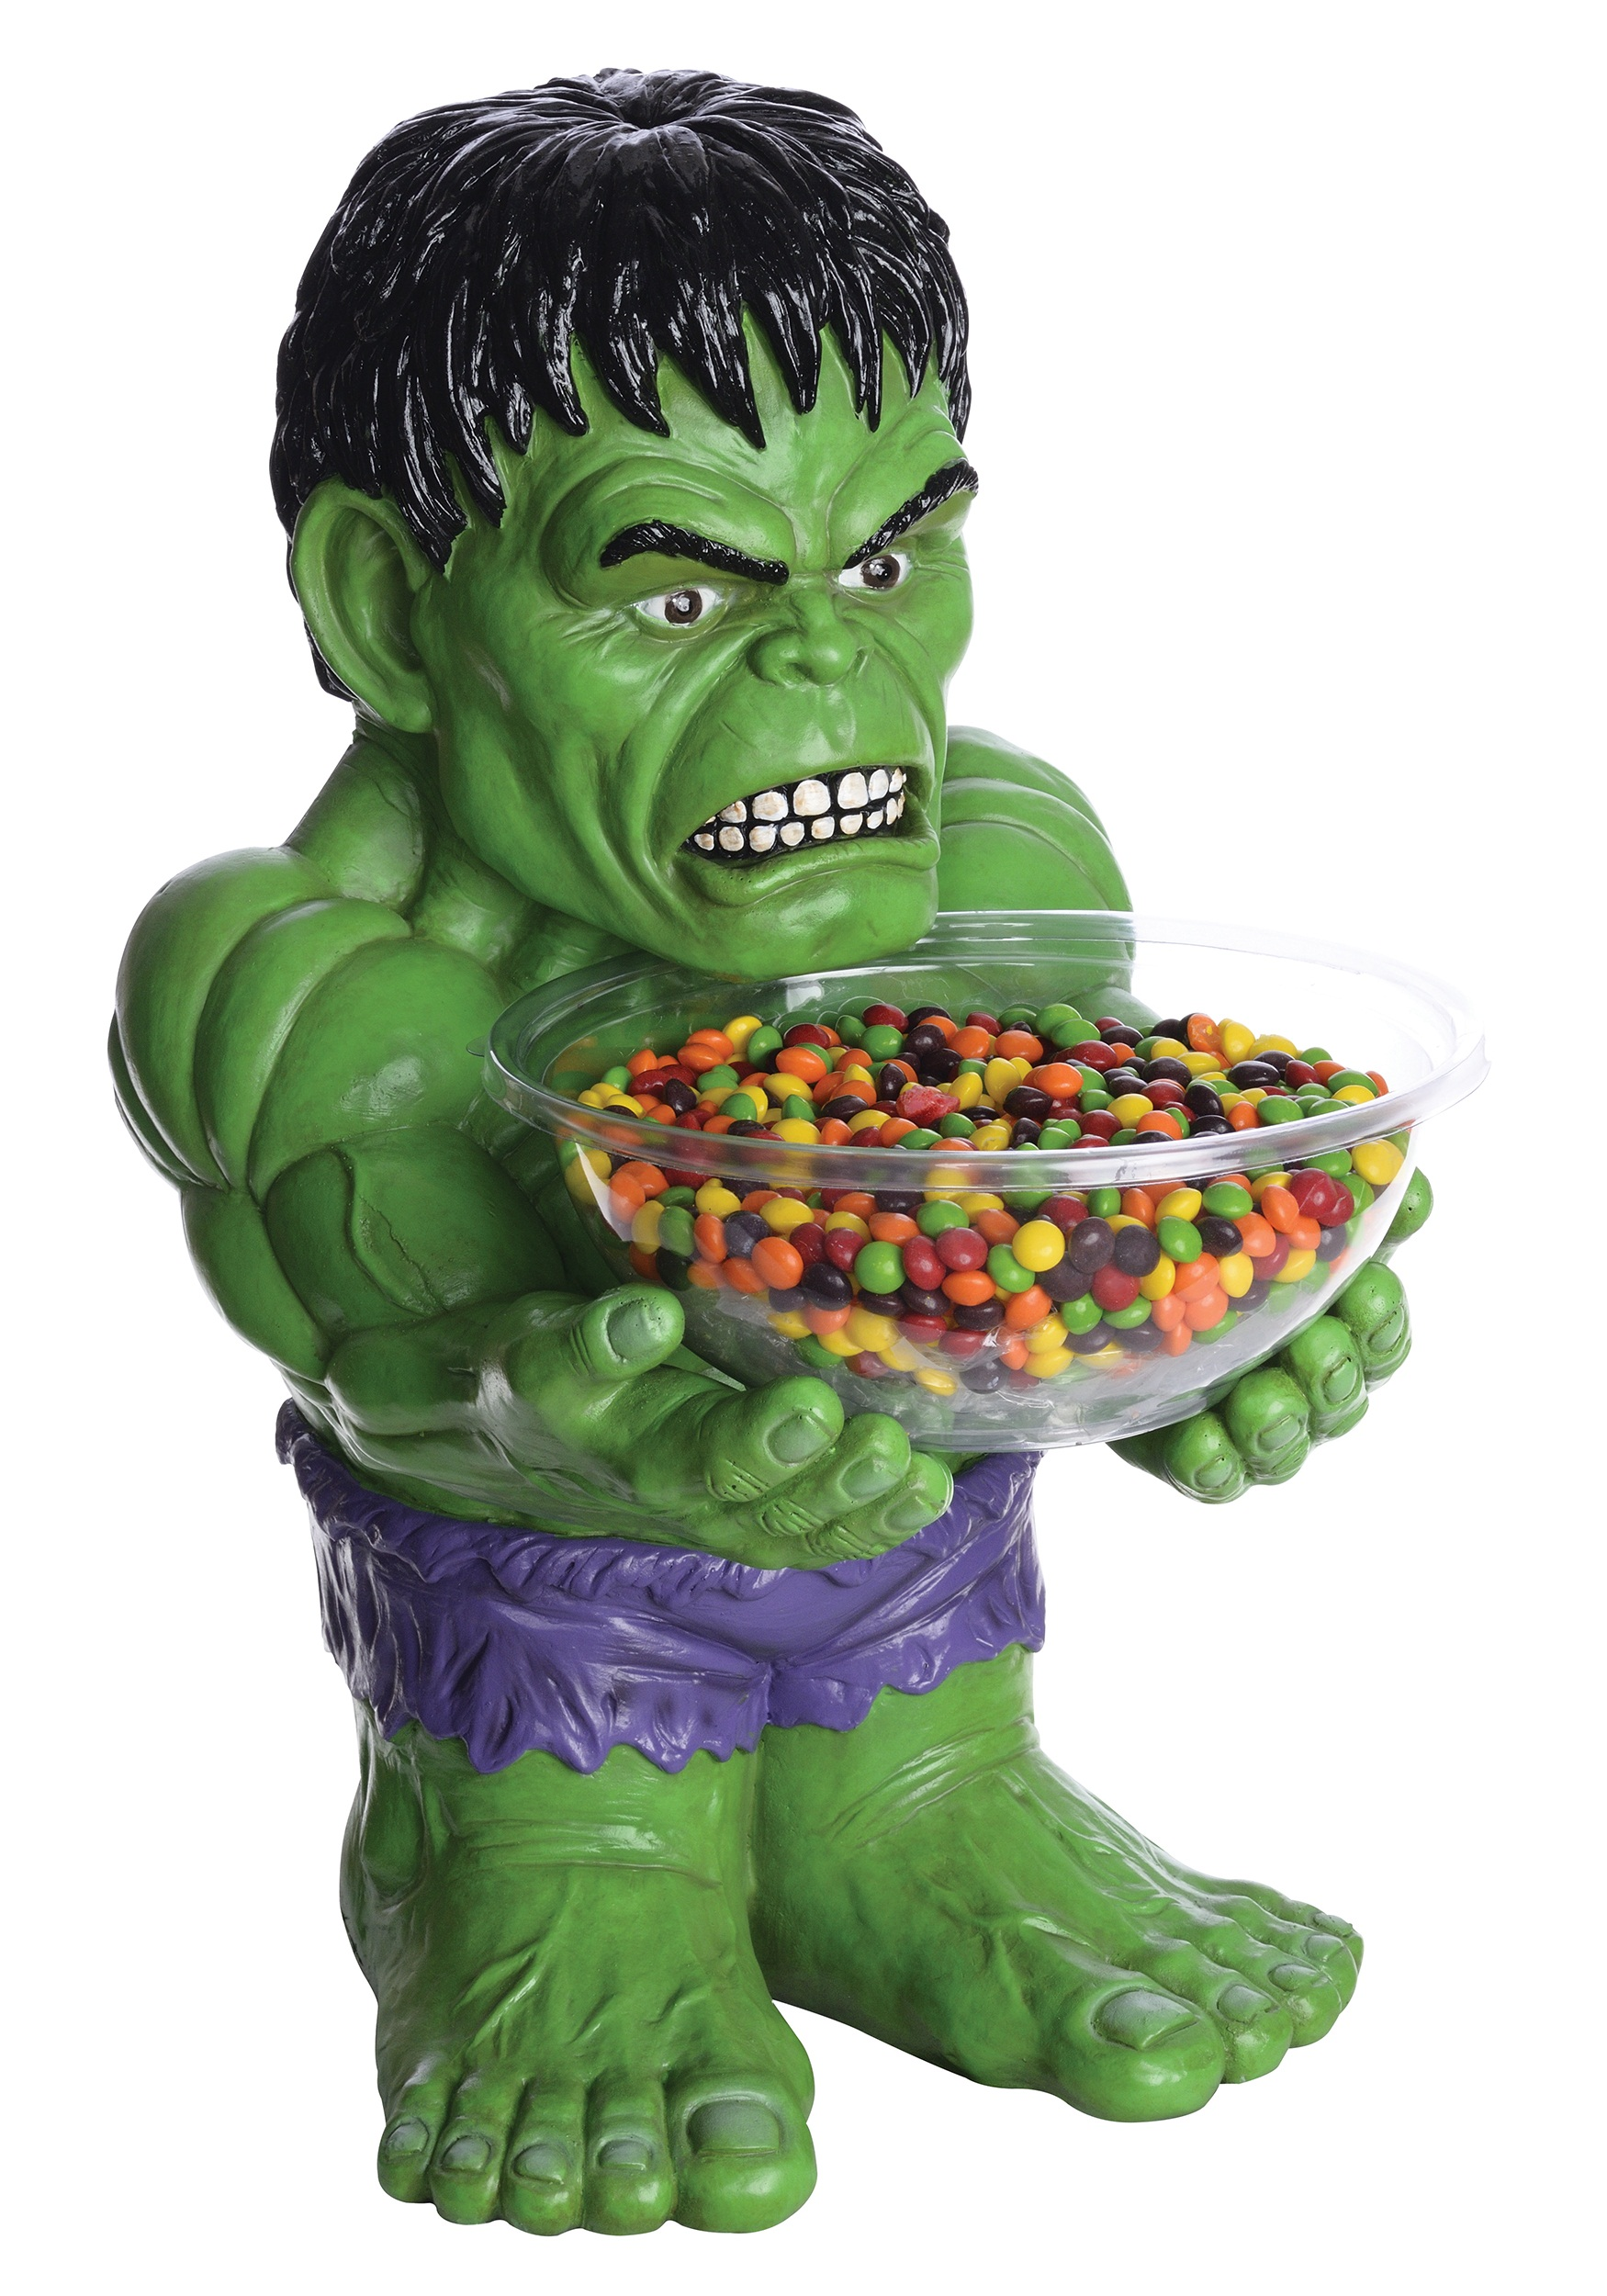 the hulk candy bowl holder